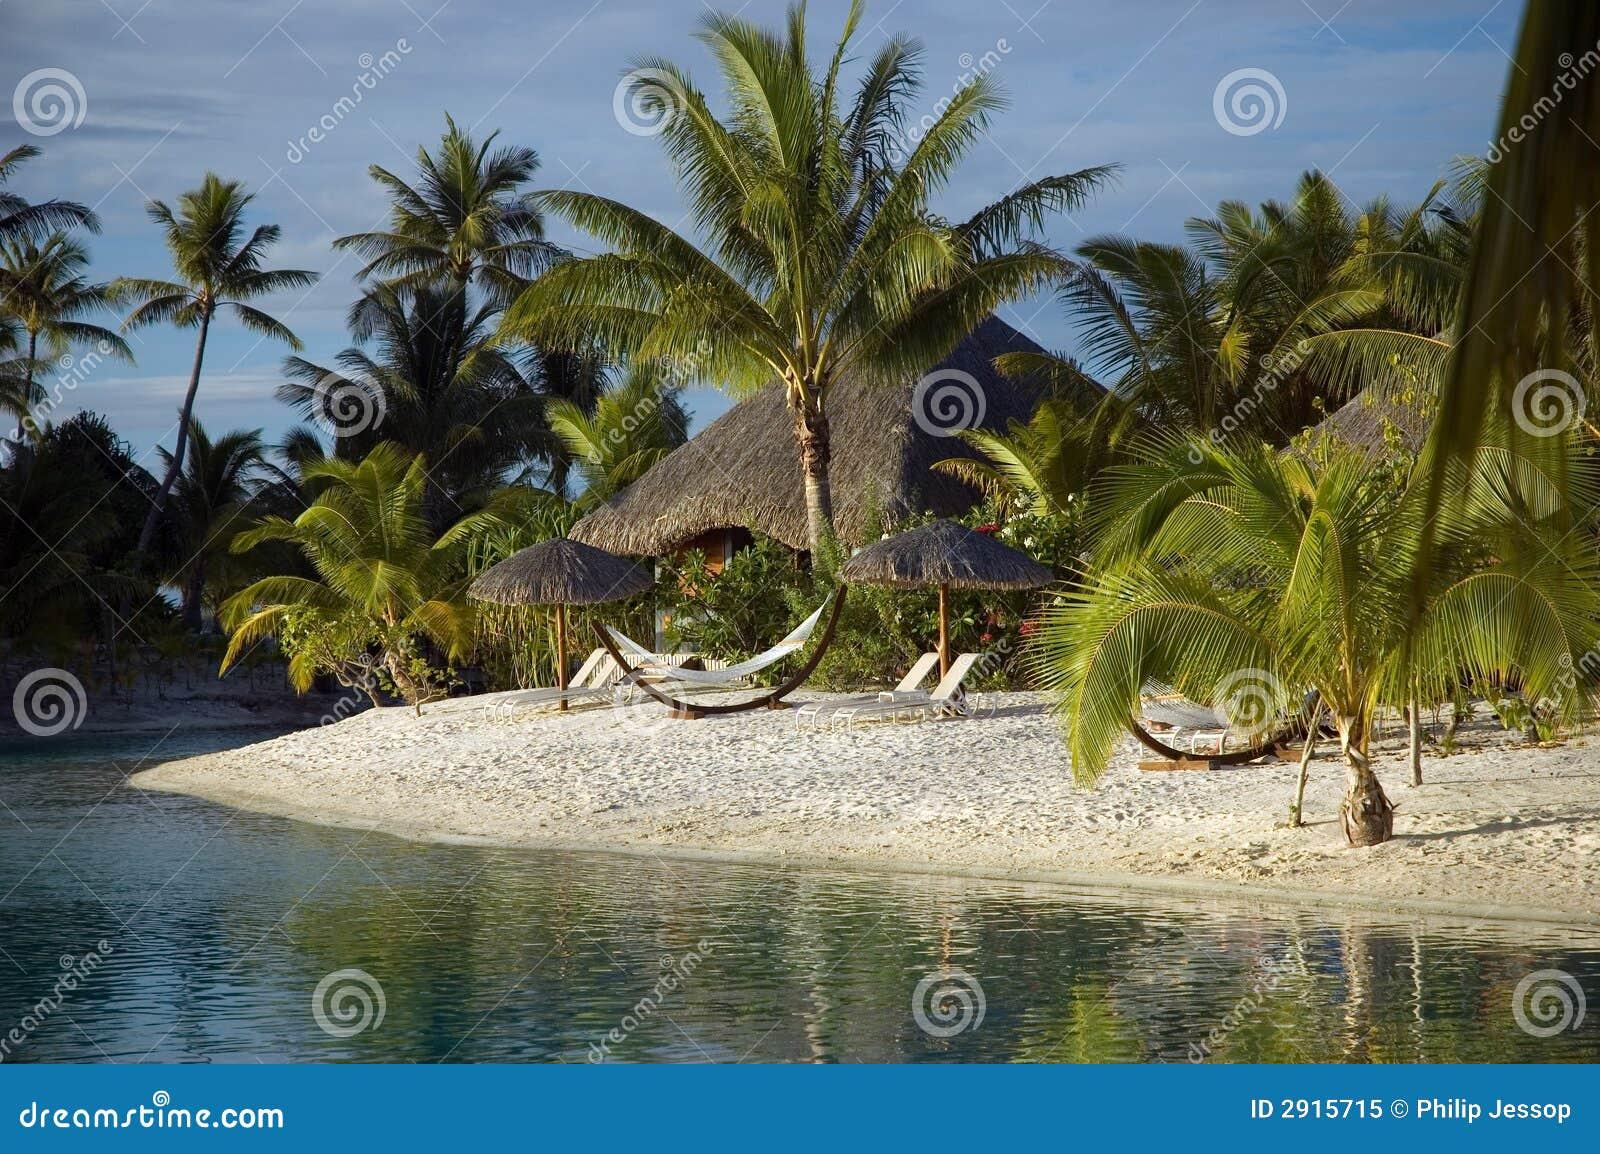 Lagoon Tropical Island: Tropical Island Lagoon Royalty Free Stock Photo